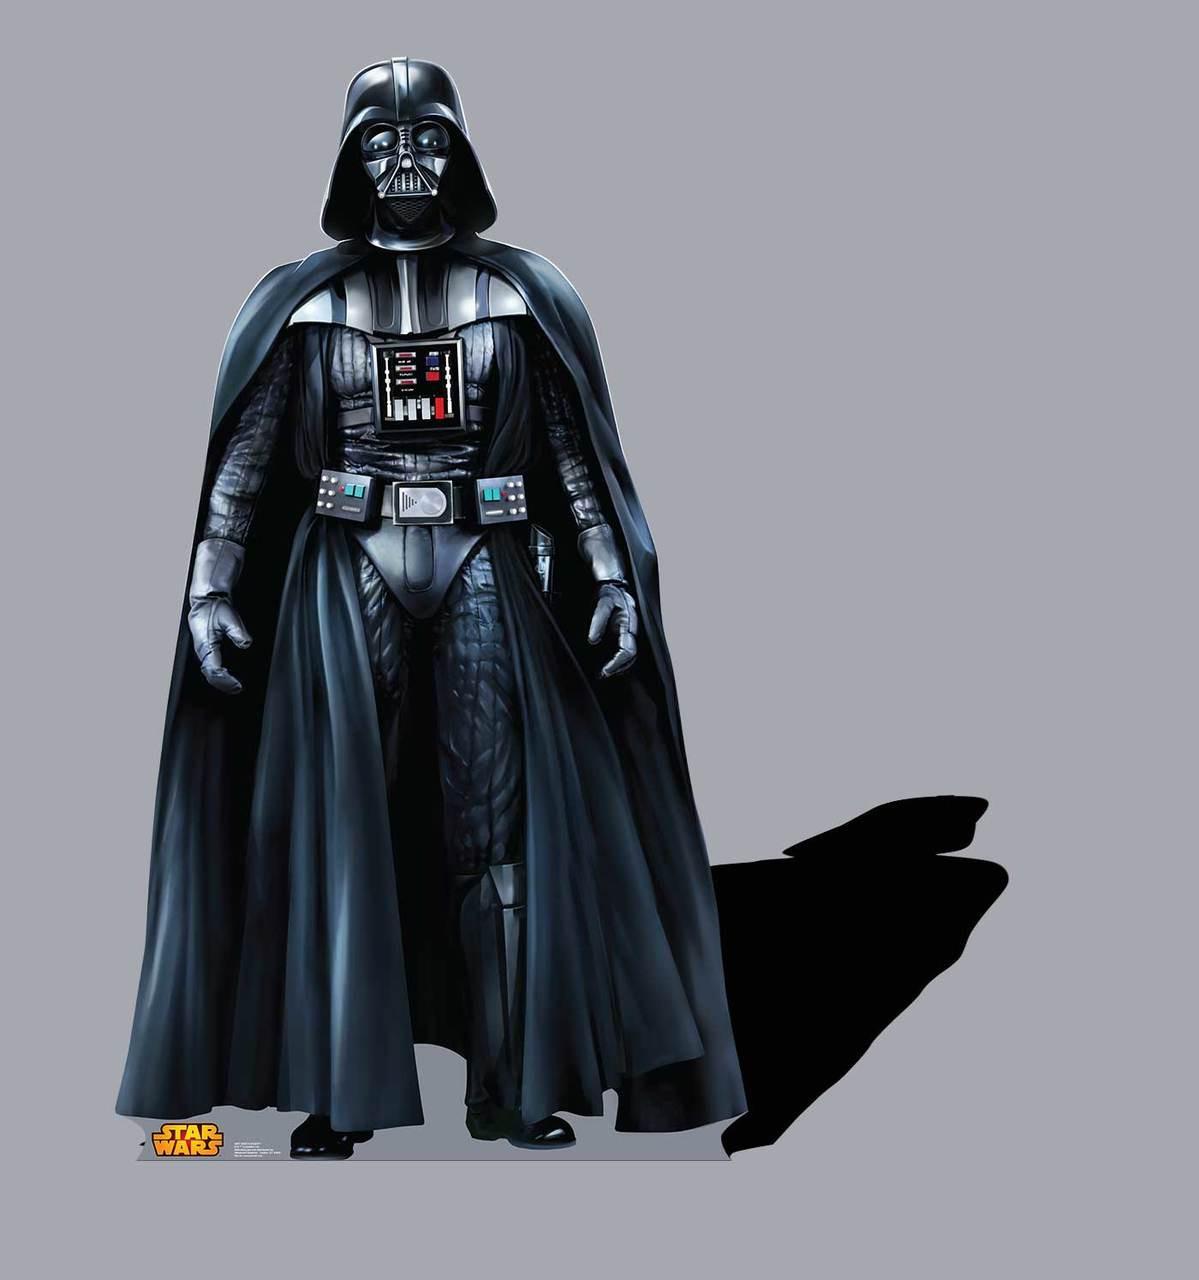 Life-size Darth Vader 2 (Star Wars) Cardboard Standup